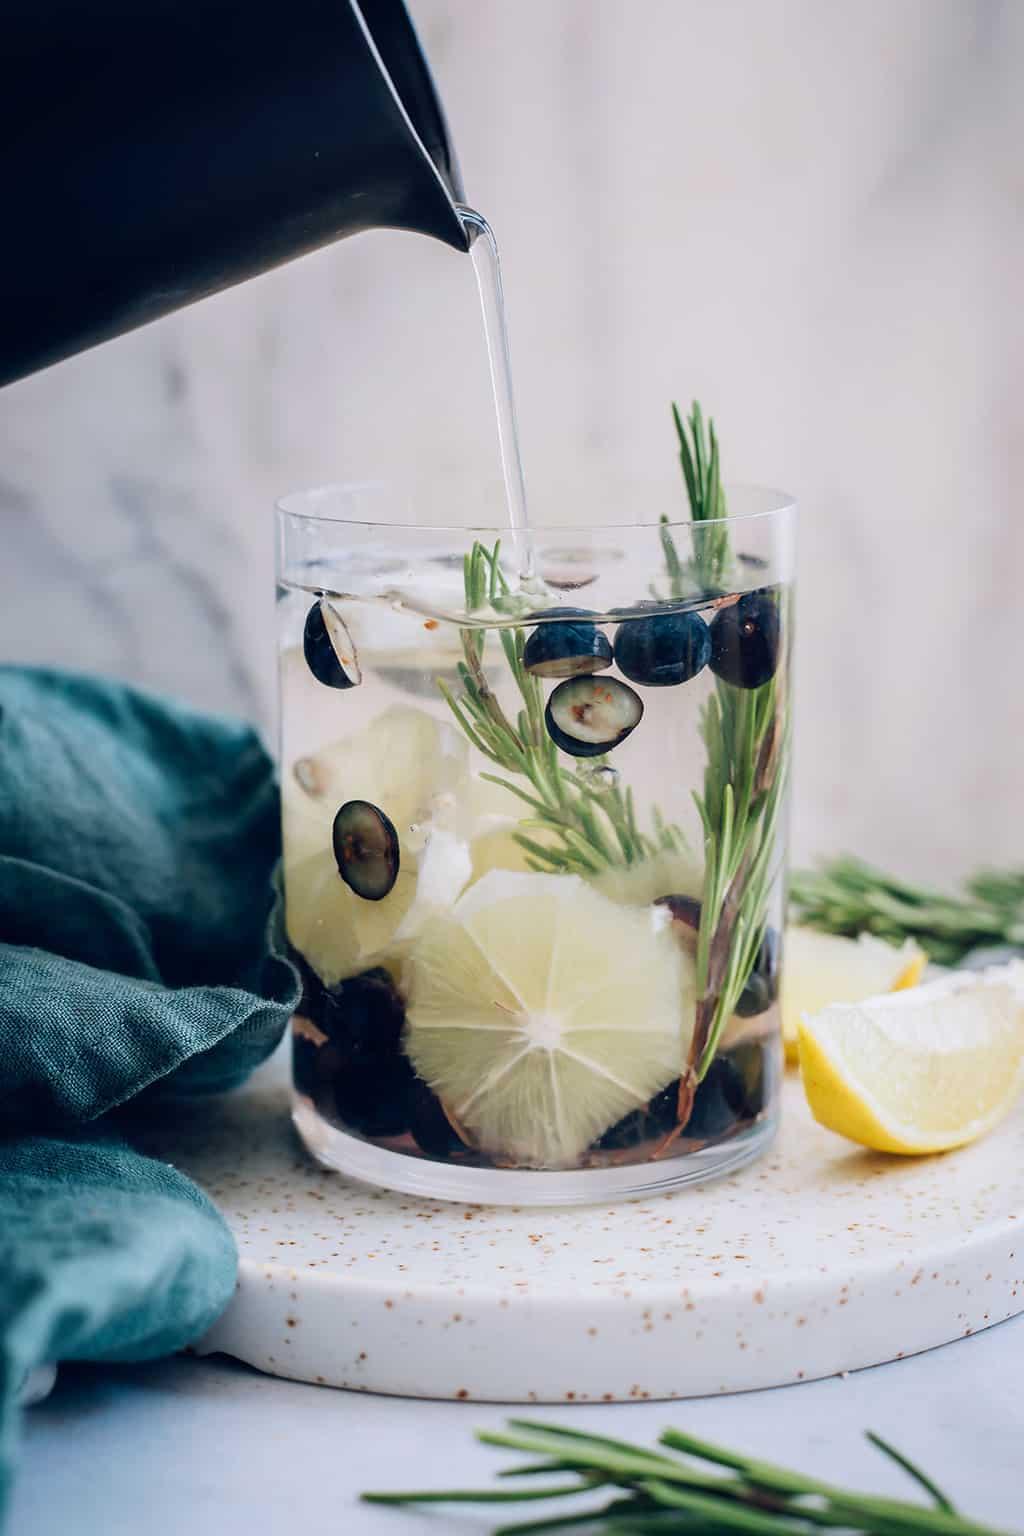 Blueberry Lemon Rosemary Infused Water